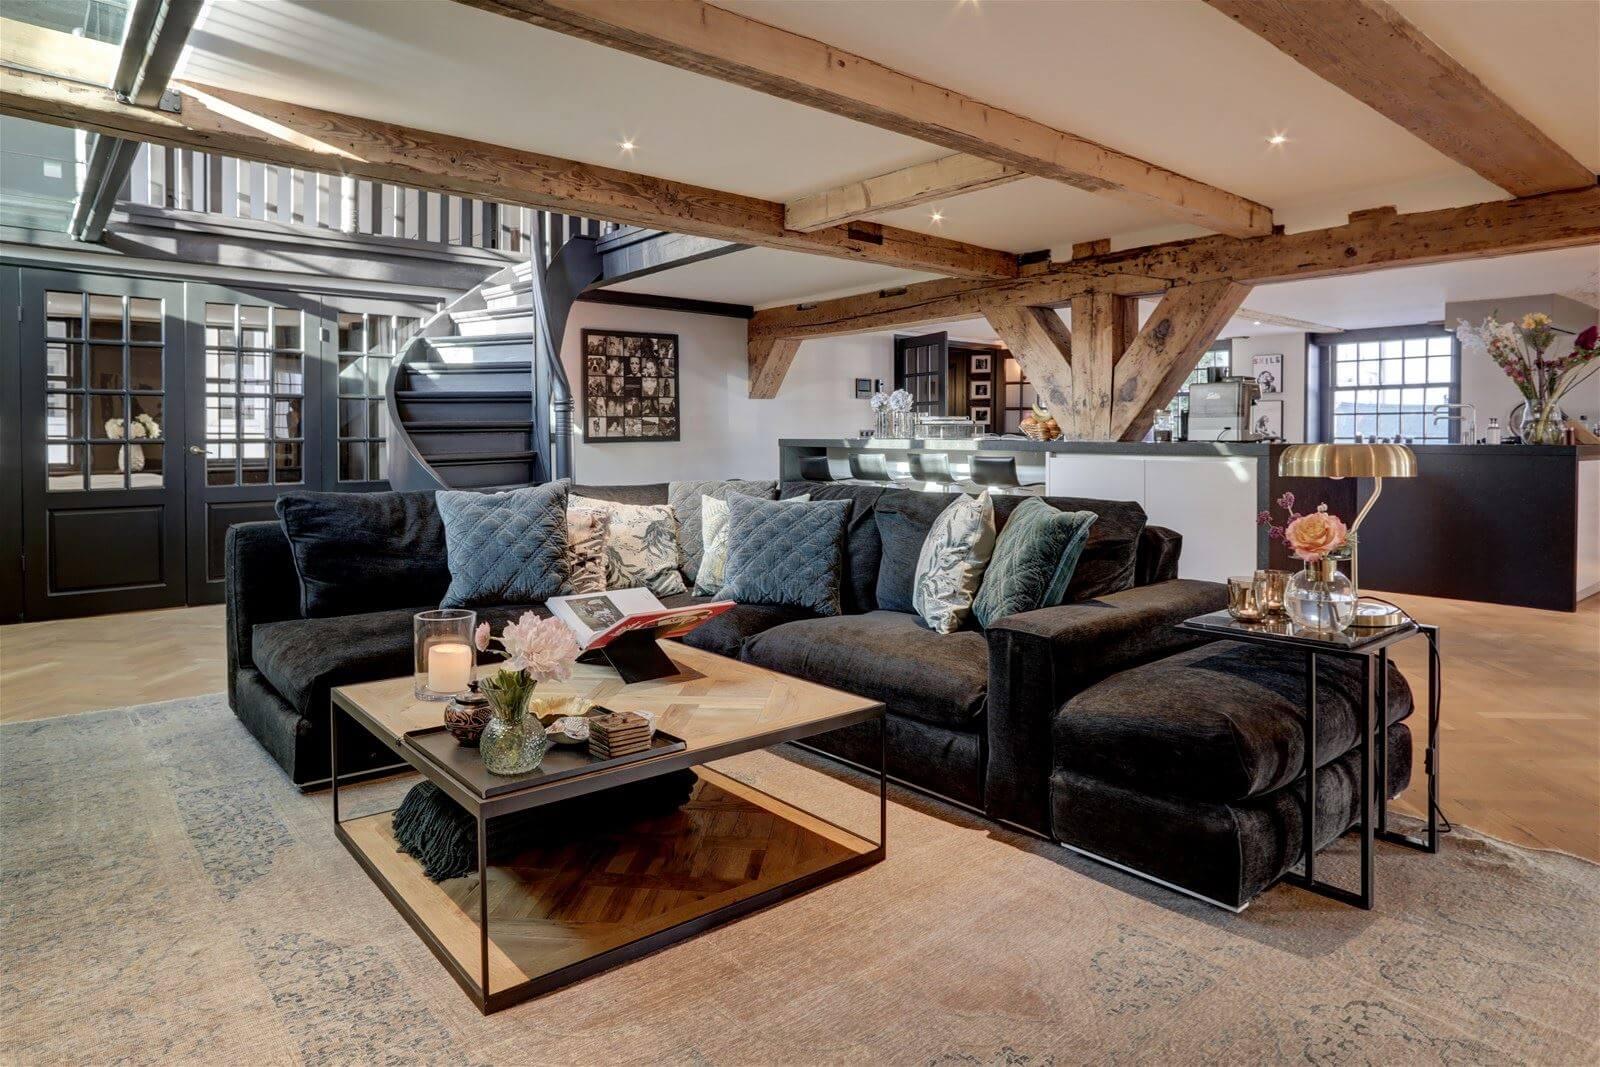 Luxurious Loft Apartment in an Amsterdam Canal Home